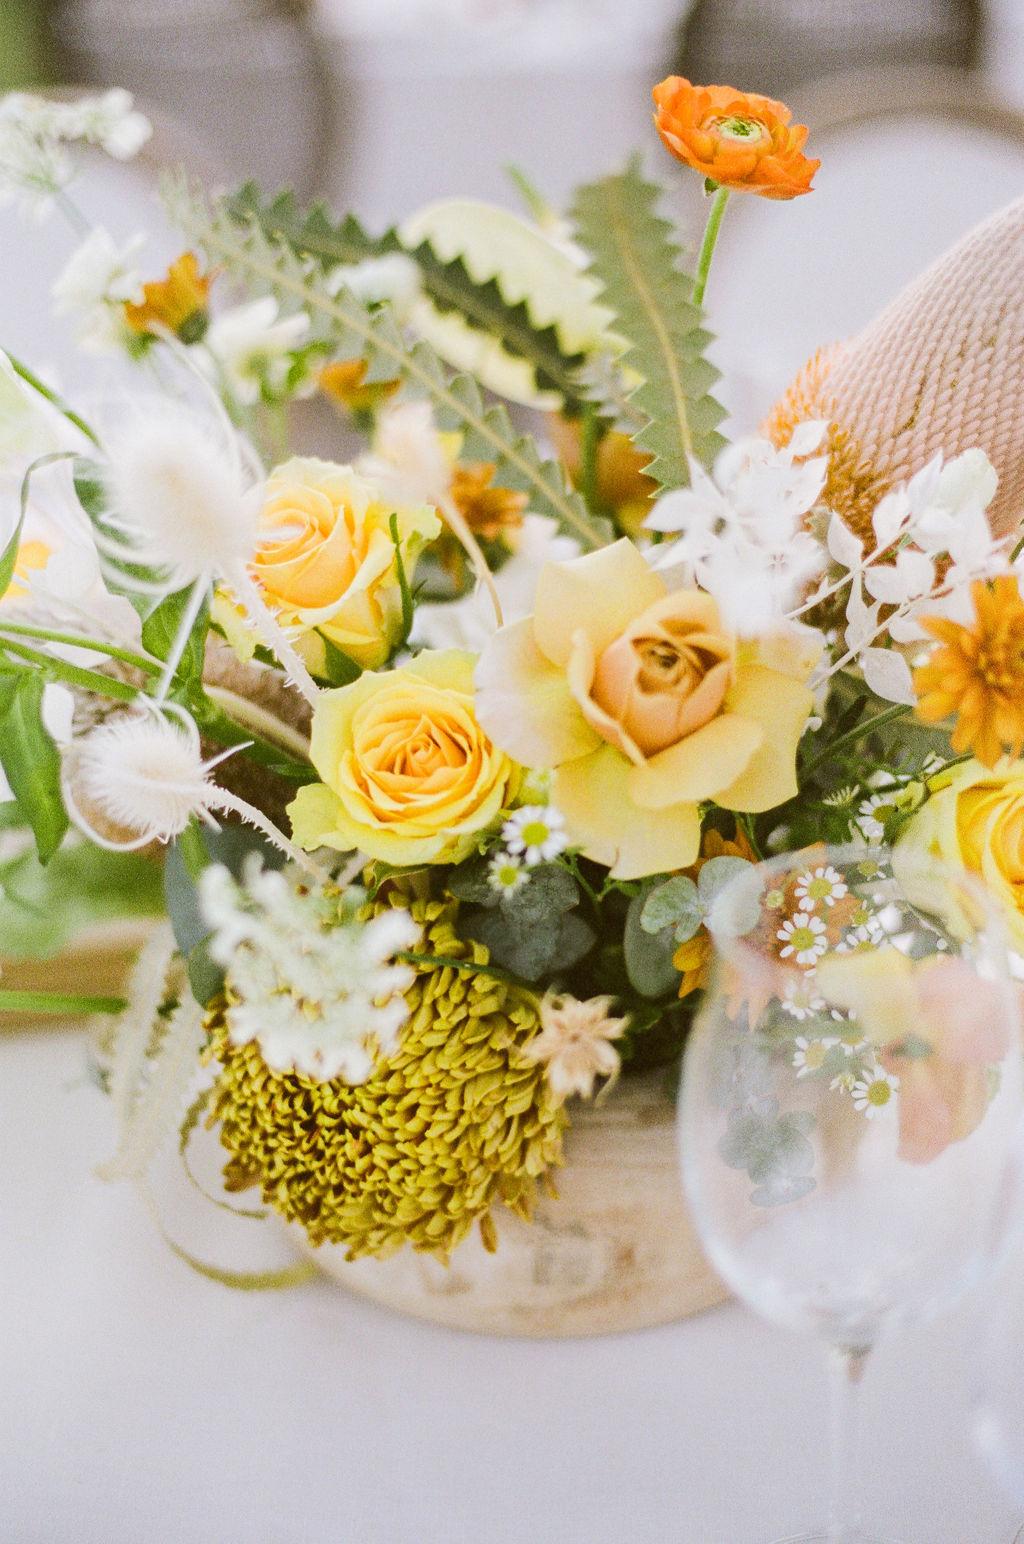 citrus colored floral bouquets at wedding reception